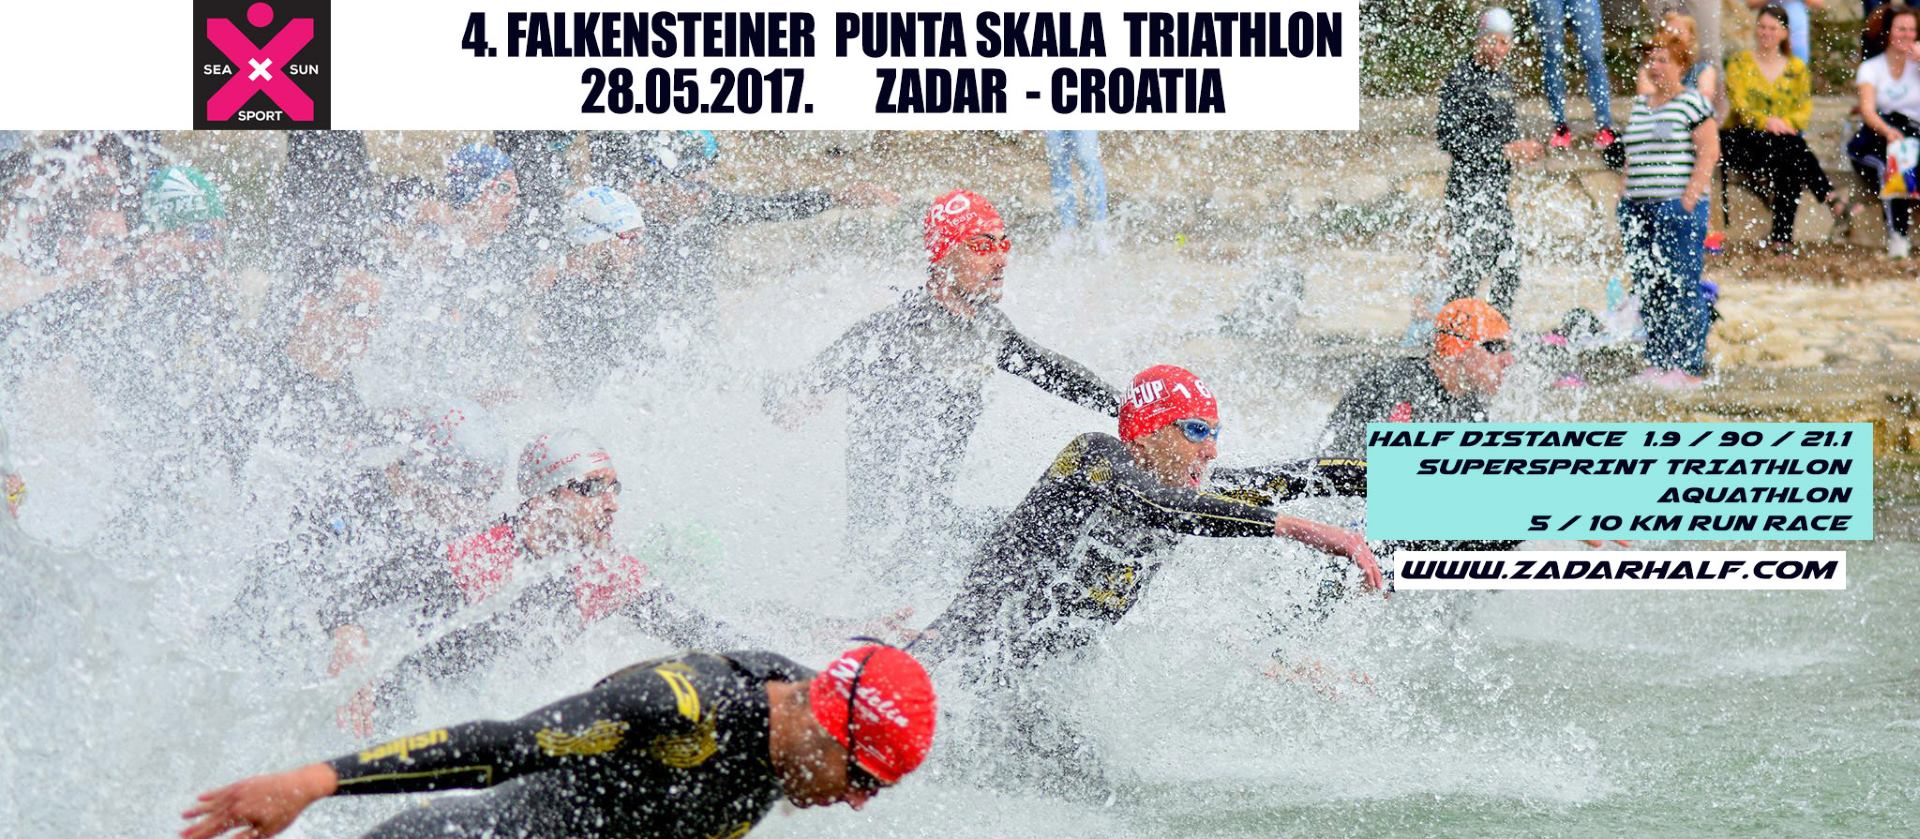 Falkensteiner Punta Skala triatlon očekuje više od 600 sportaša i rekreativaca